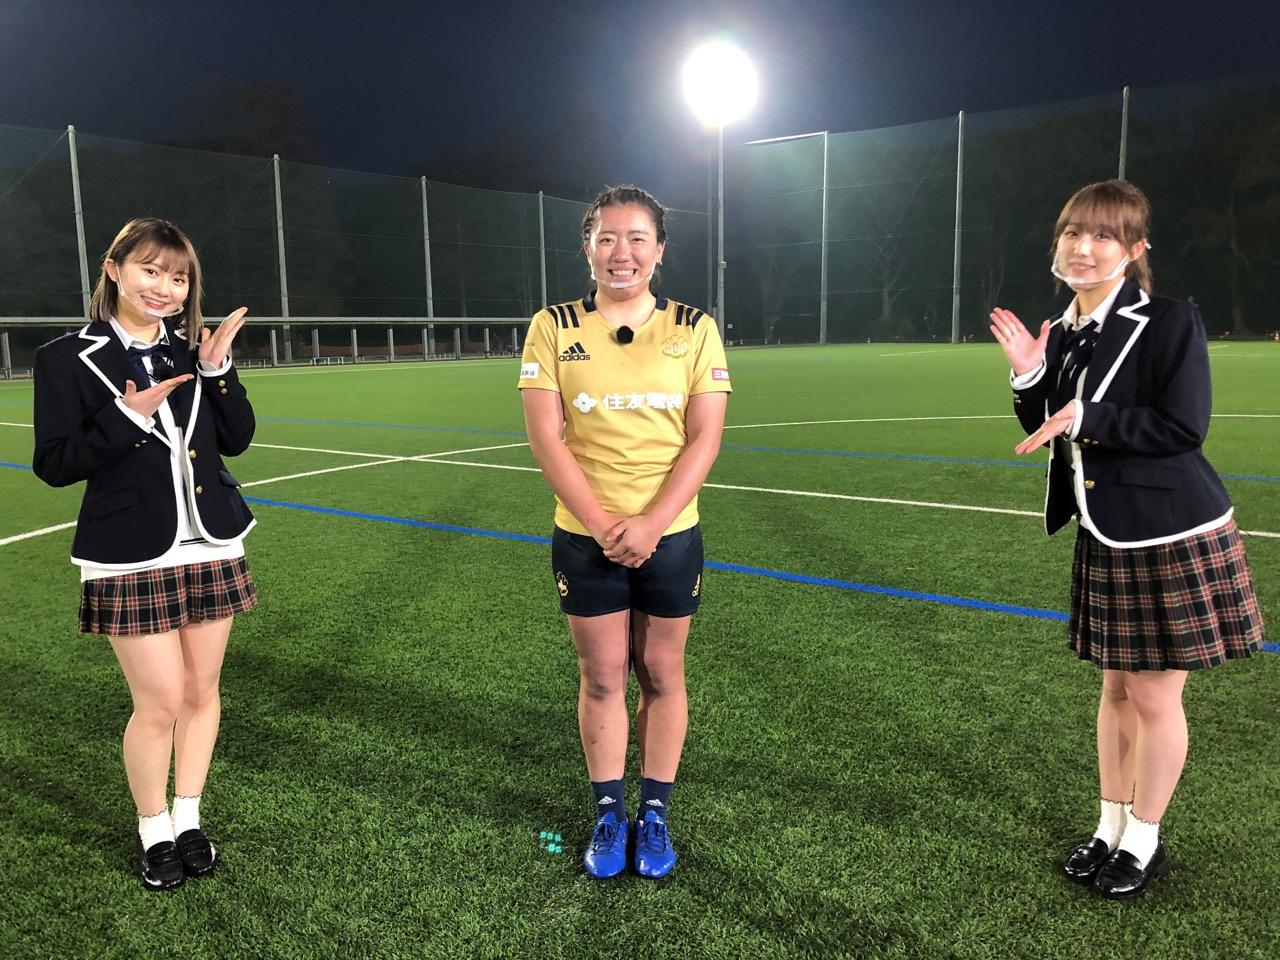 「SKE48は君と歌いたい」鎌田菜月&松本慈子が女子ラグビーチーム・PEARLSの練習場を訪れる②【東海テレビ】